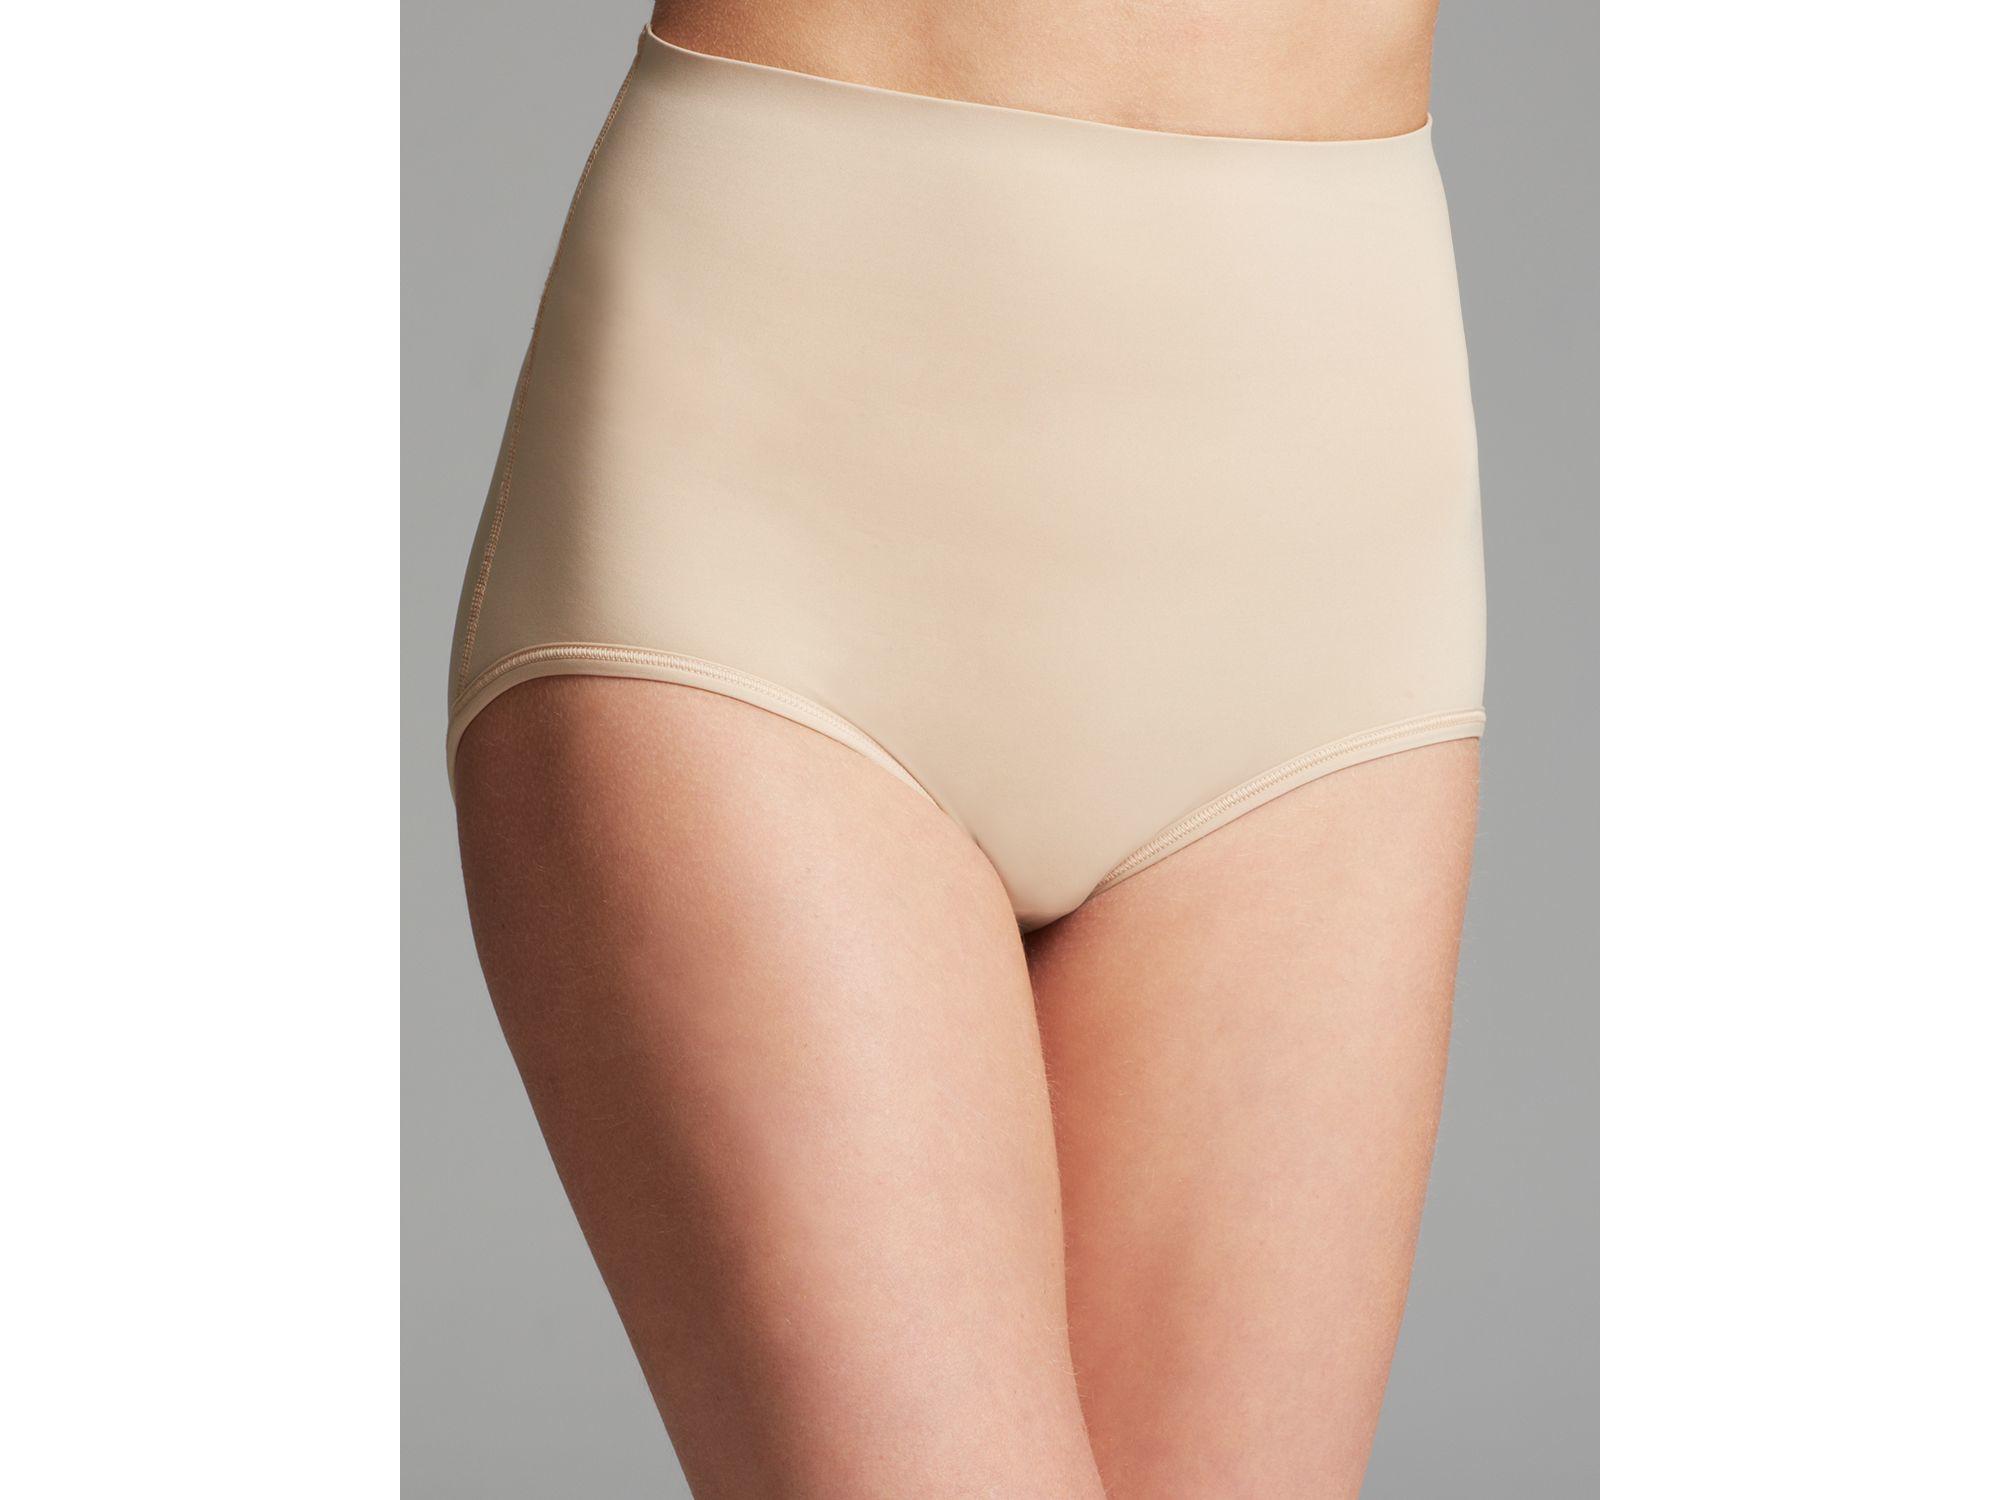 ef0ada533 Lyst - Spanx ® Brief - Trust Your Thinstincts Uplifting Booty Bra ...